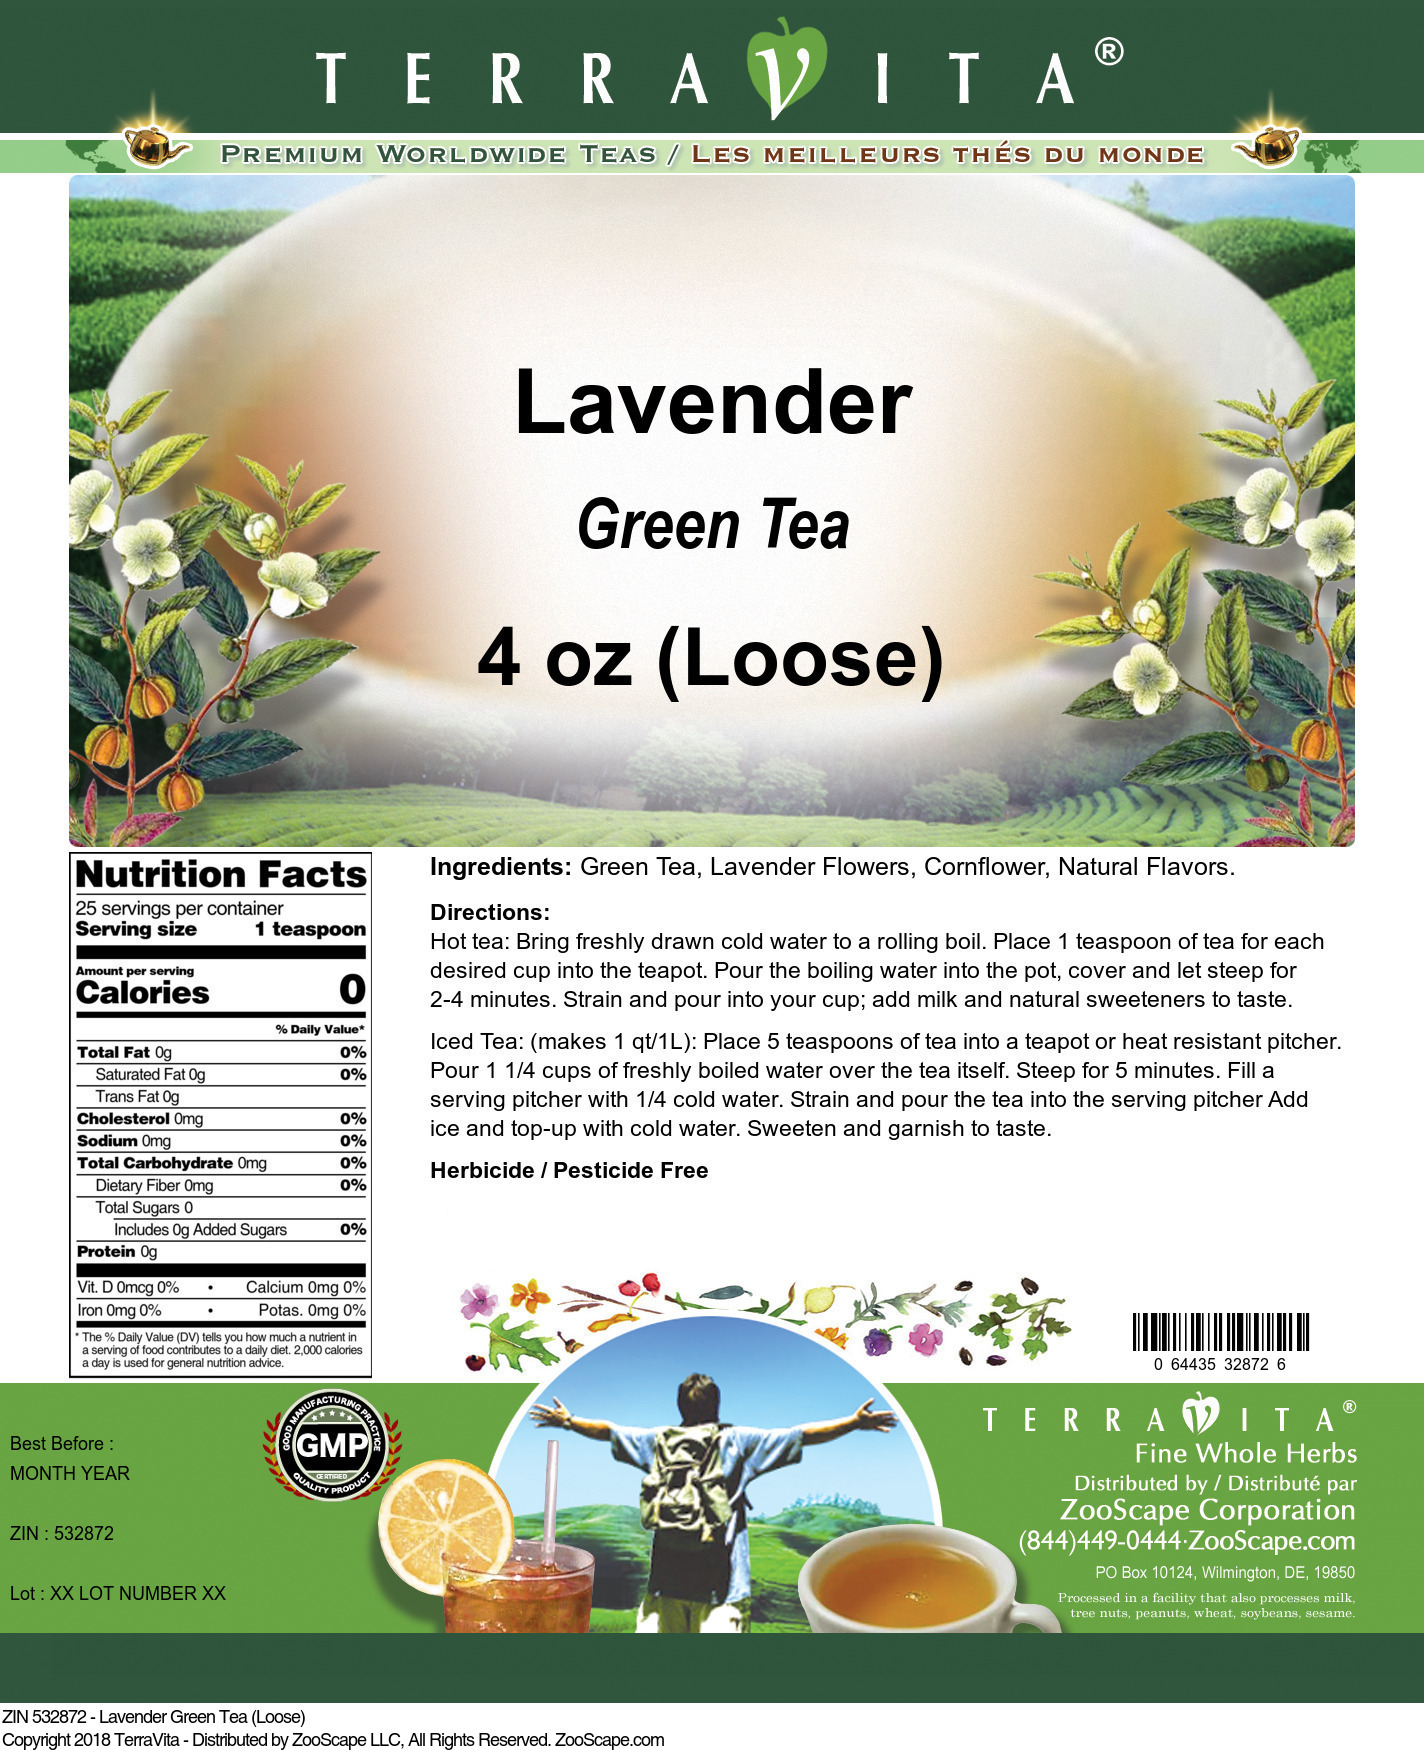 Lavender Green Tea (Loose)